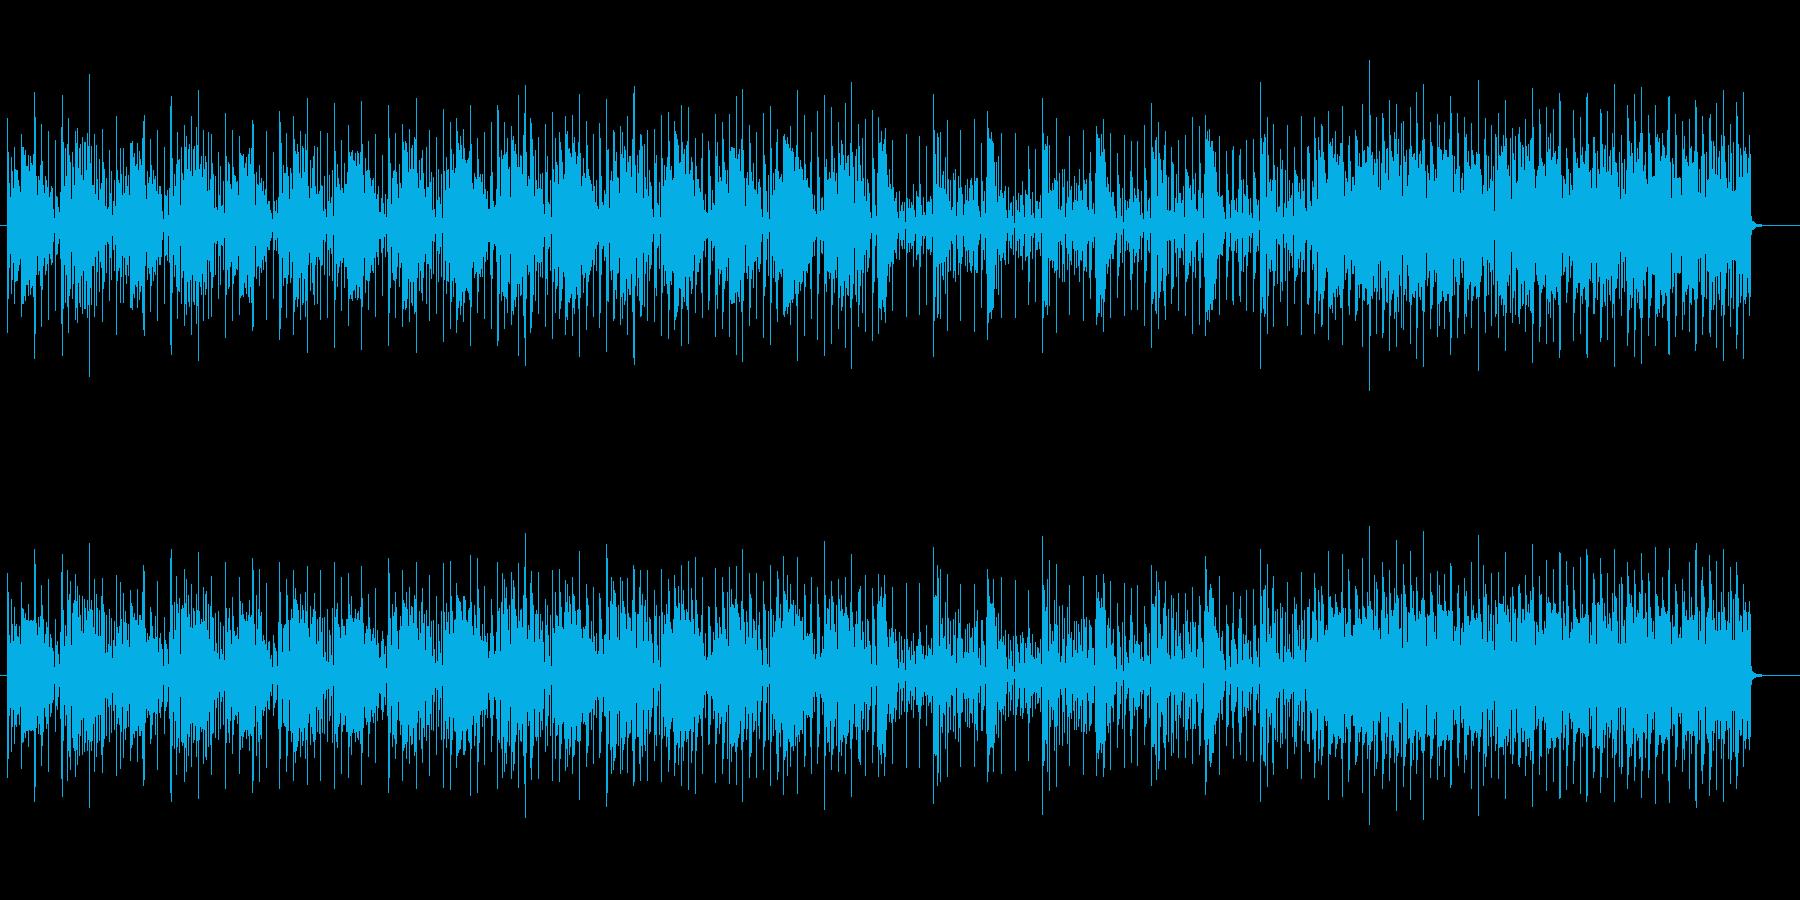 SF感ある神秘的なテクノサウンドの再生済みの波形